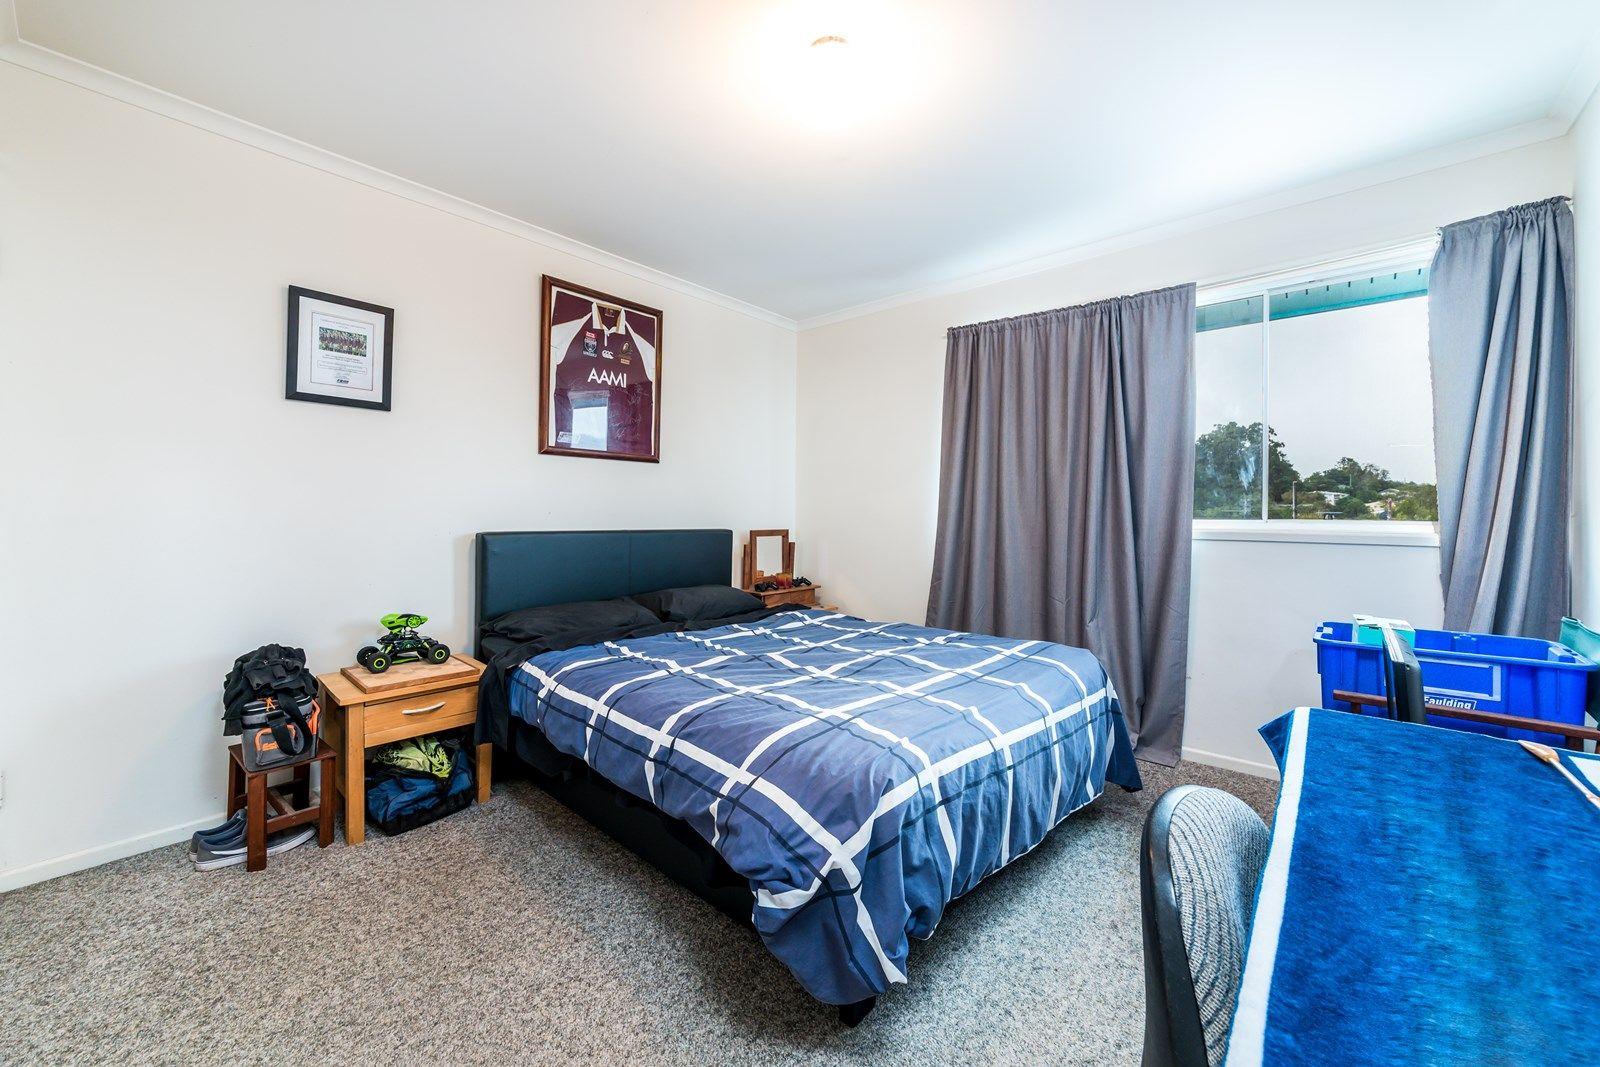 2/8 Solandra Street, Nambour QLD 4560, Image 1